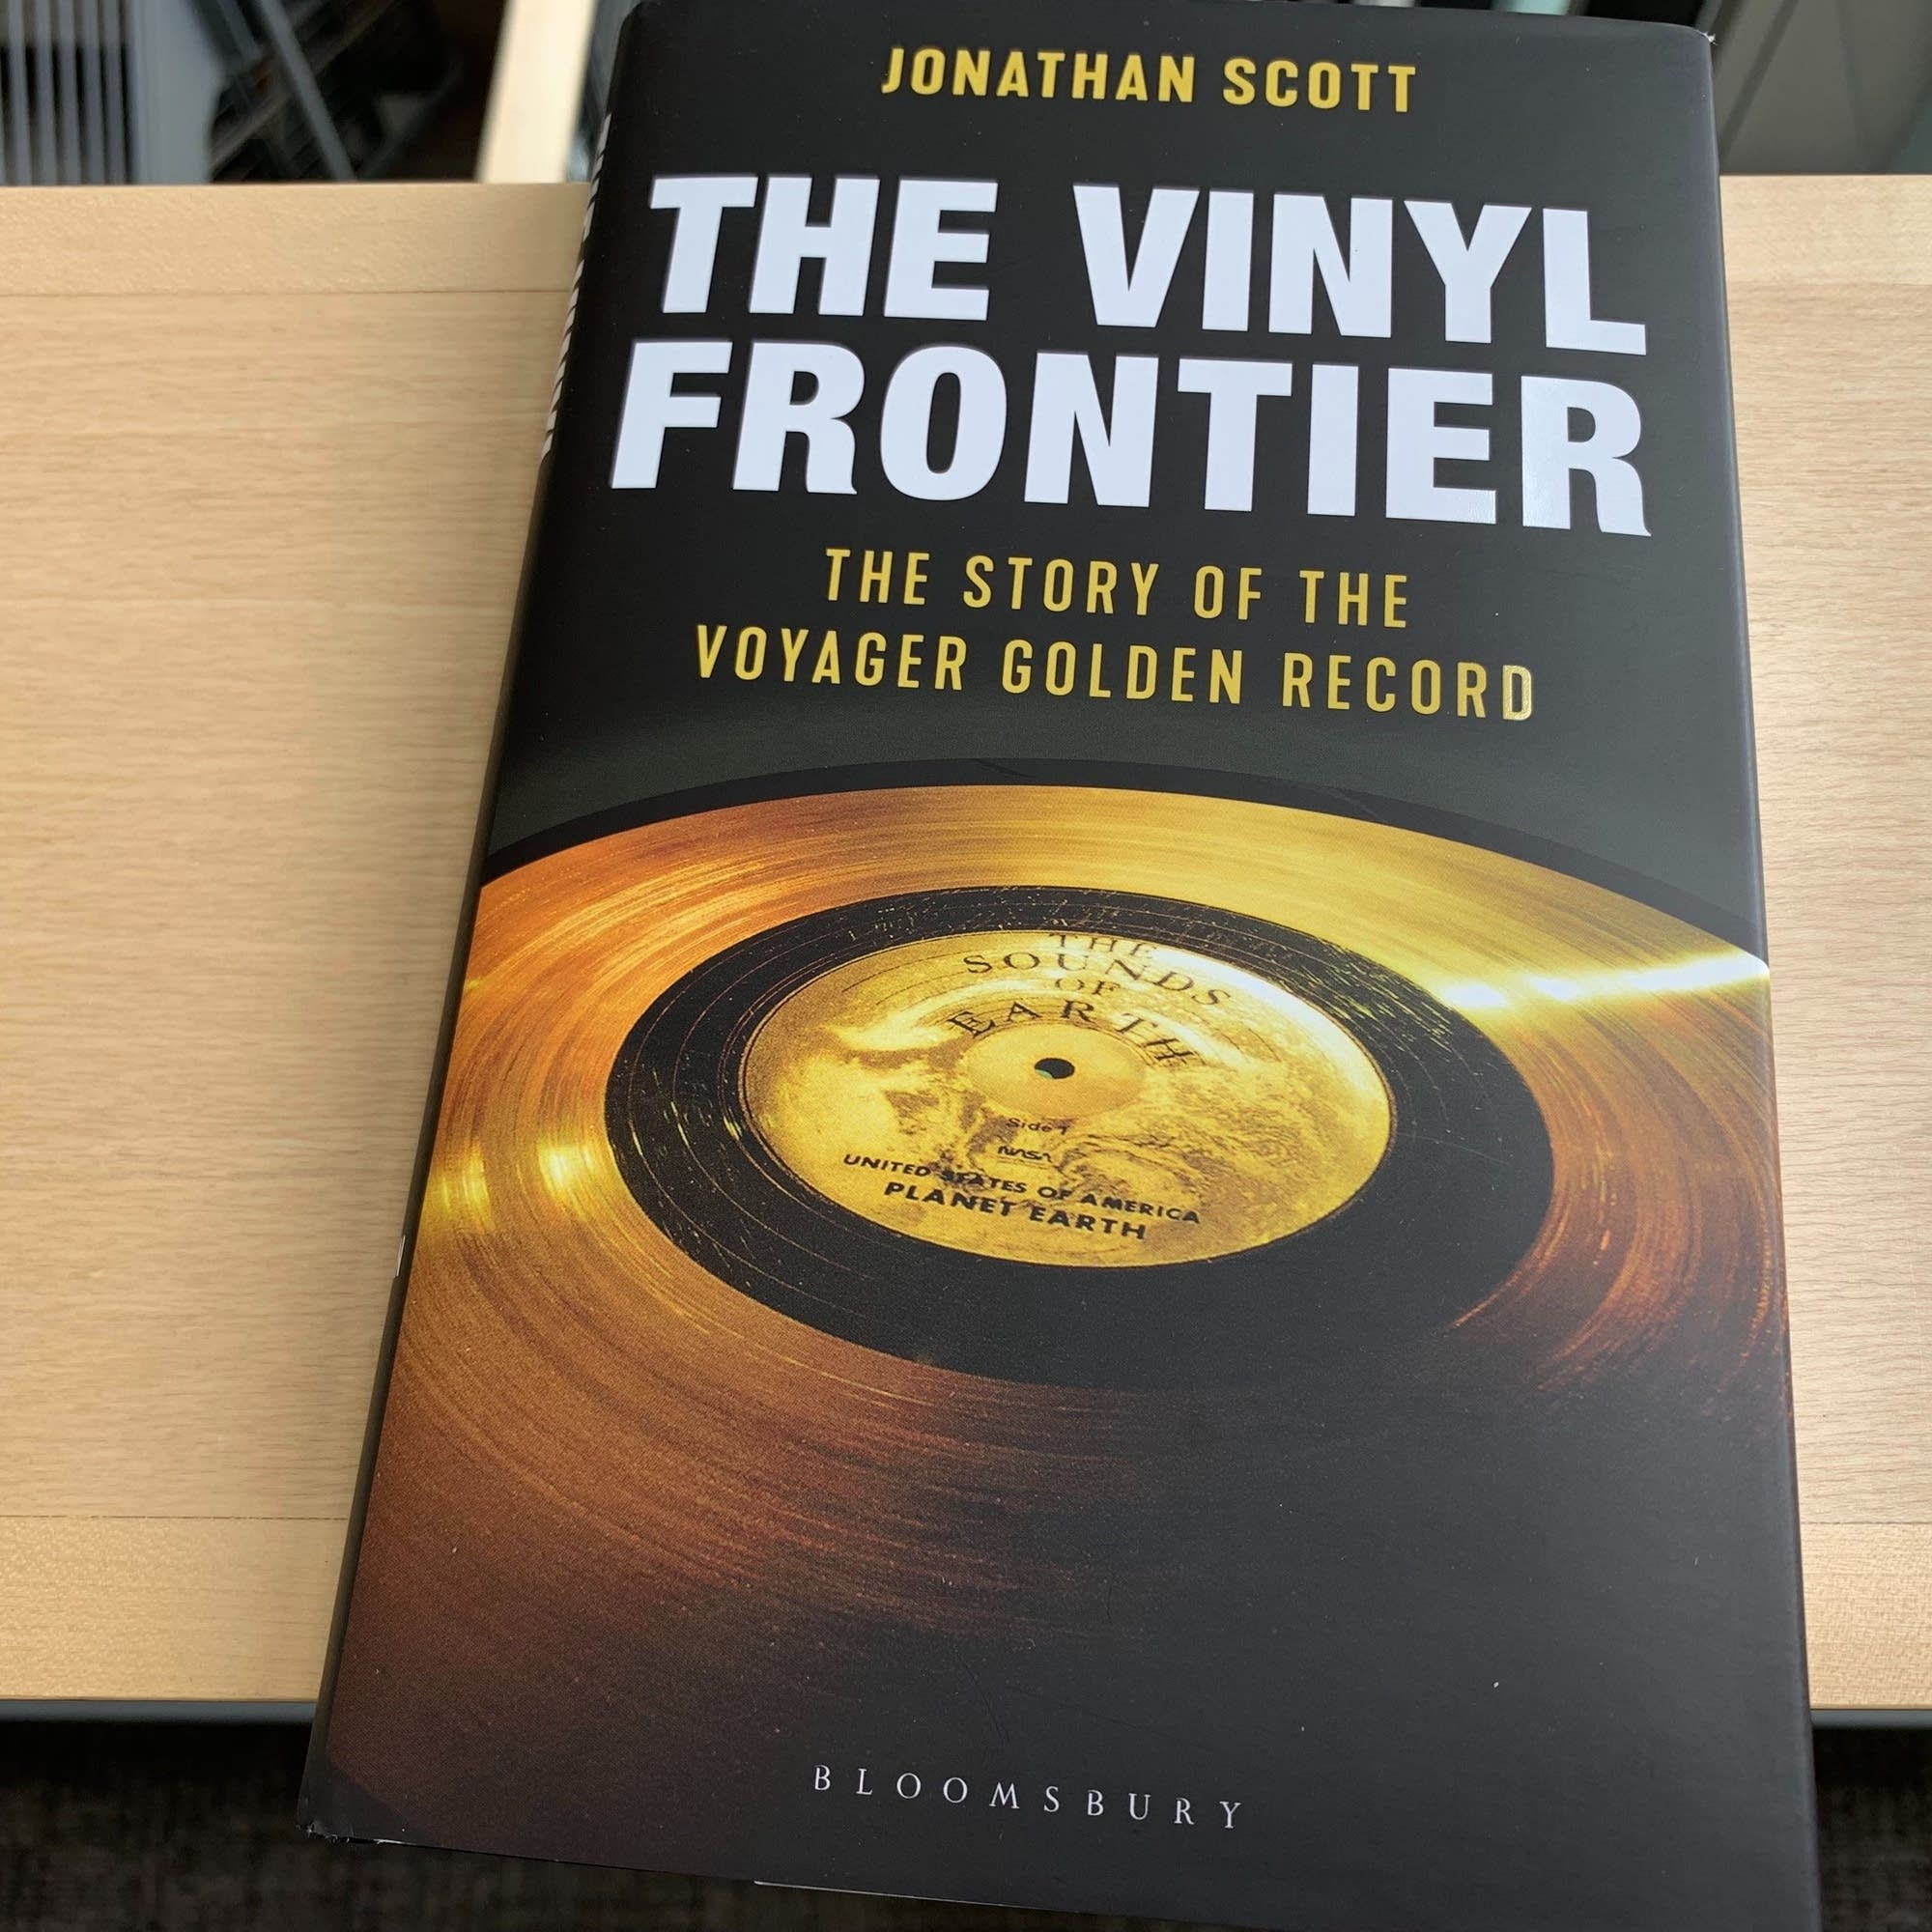 Jonathan Scott's 'The Vinyl Frontier.'